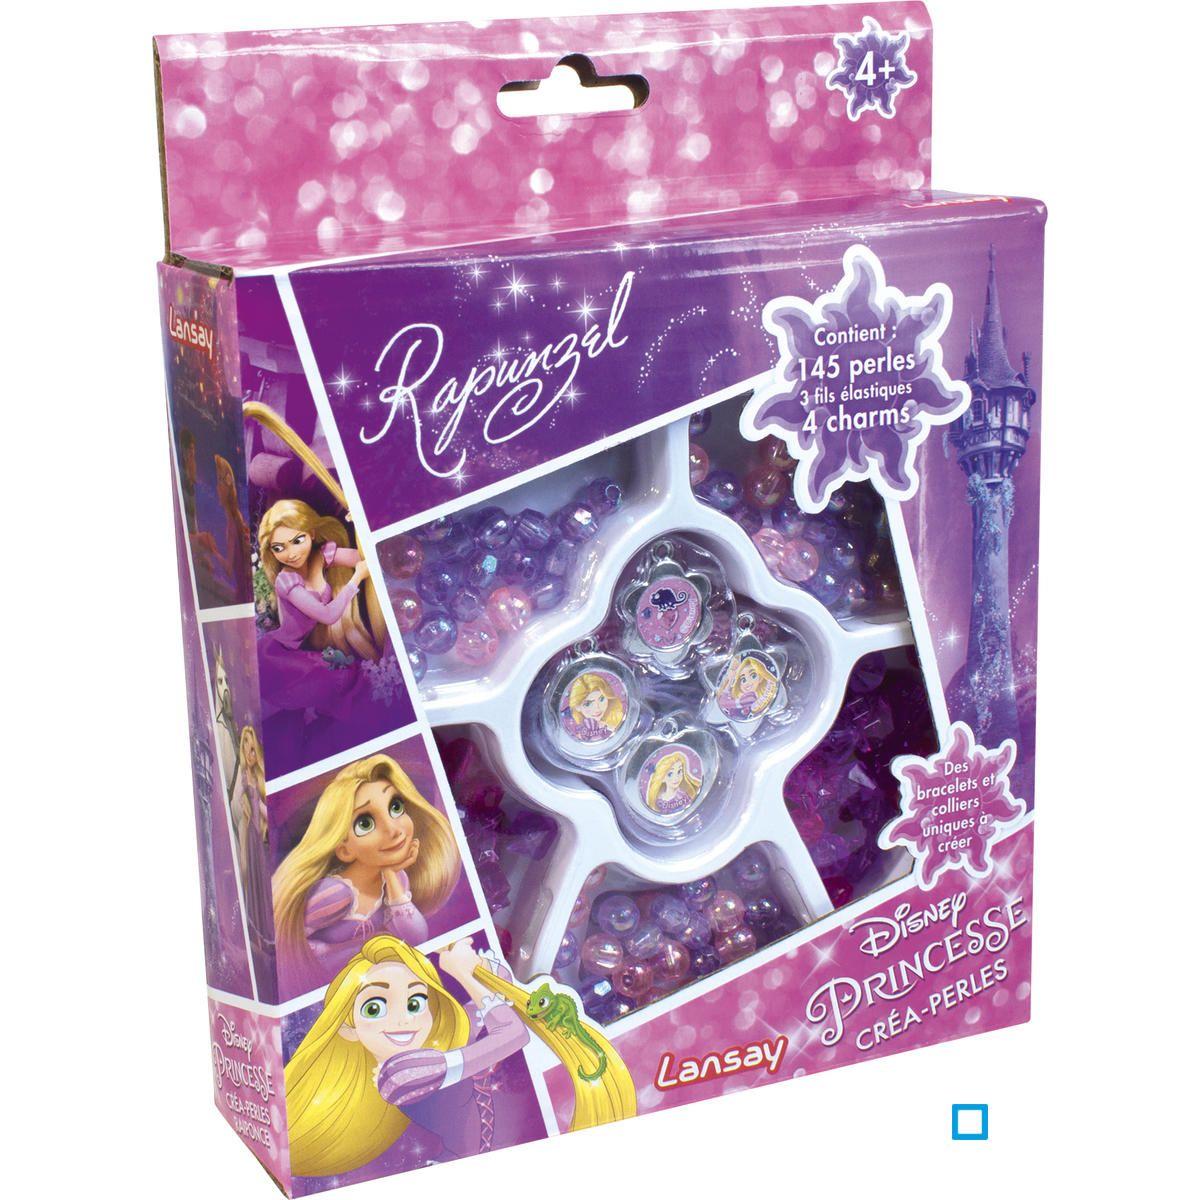 Disney princesses créa perles raiponce lan25113 Lansay | La